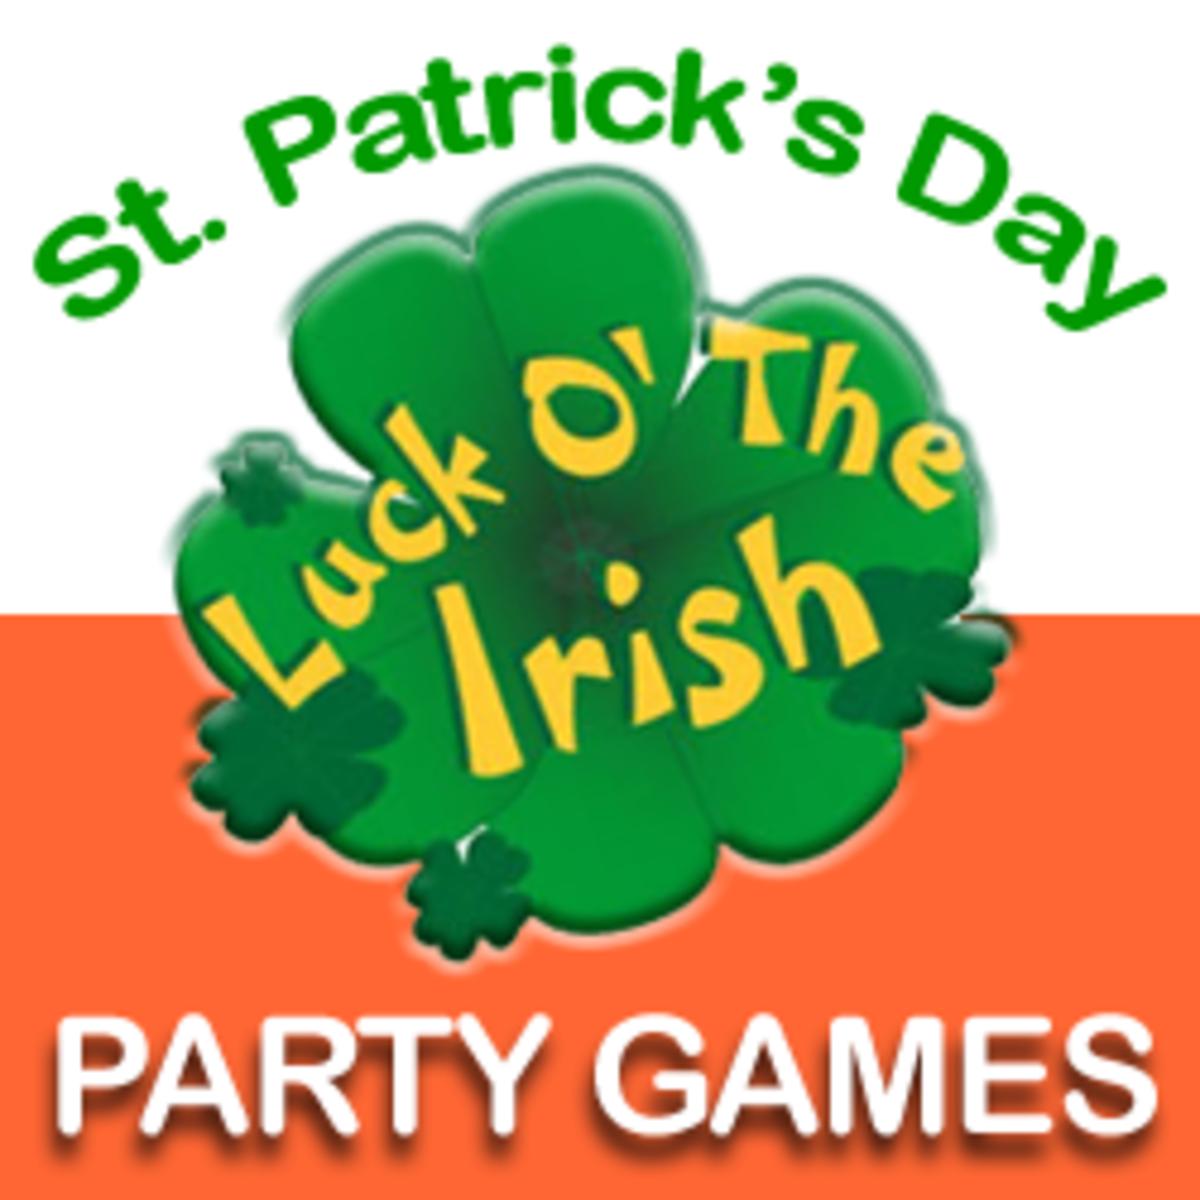 stpatricks-games-party